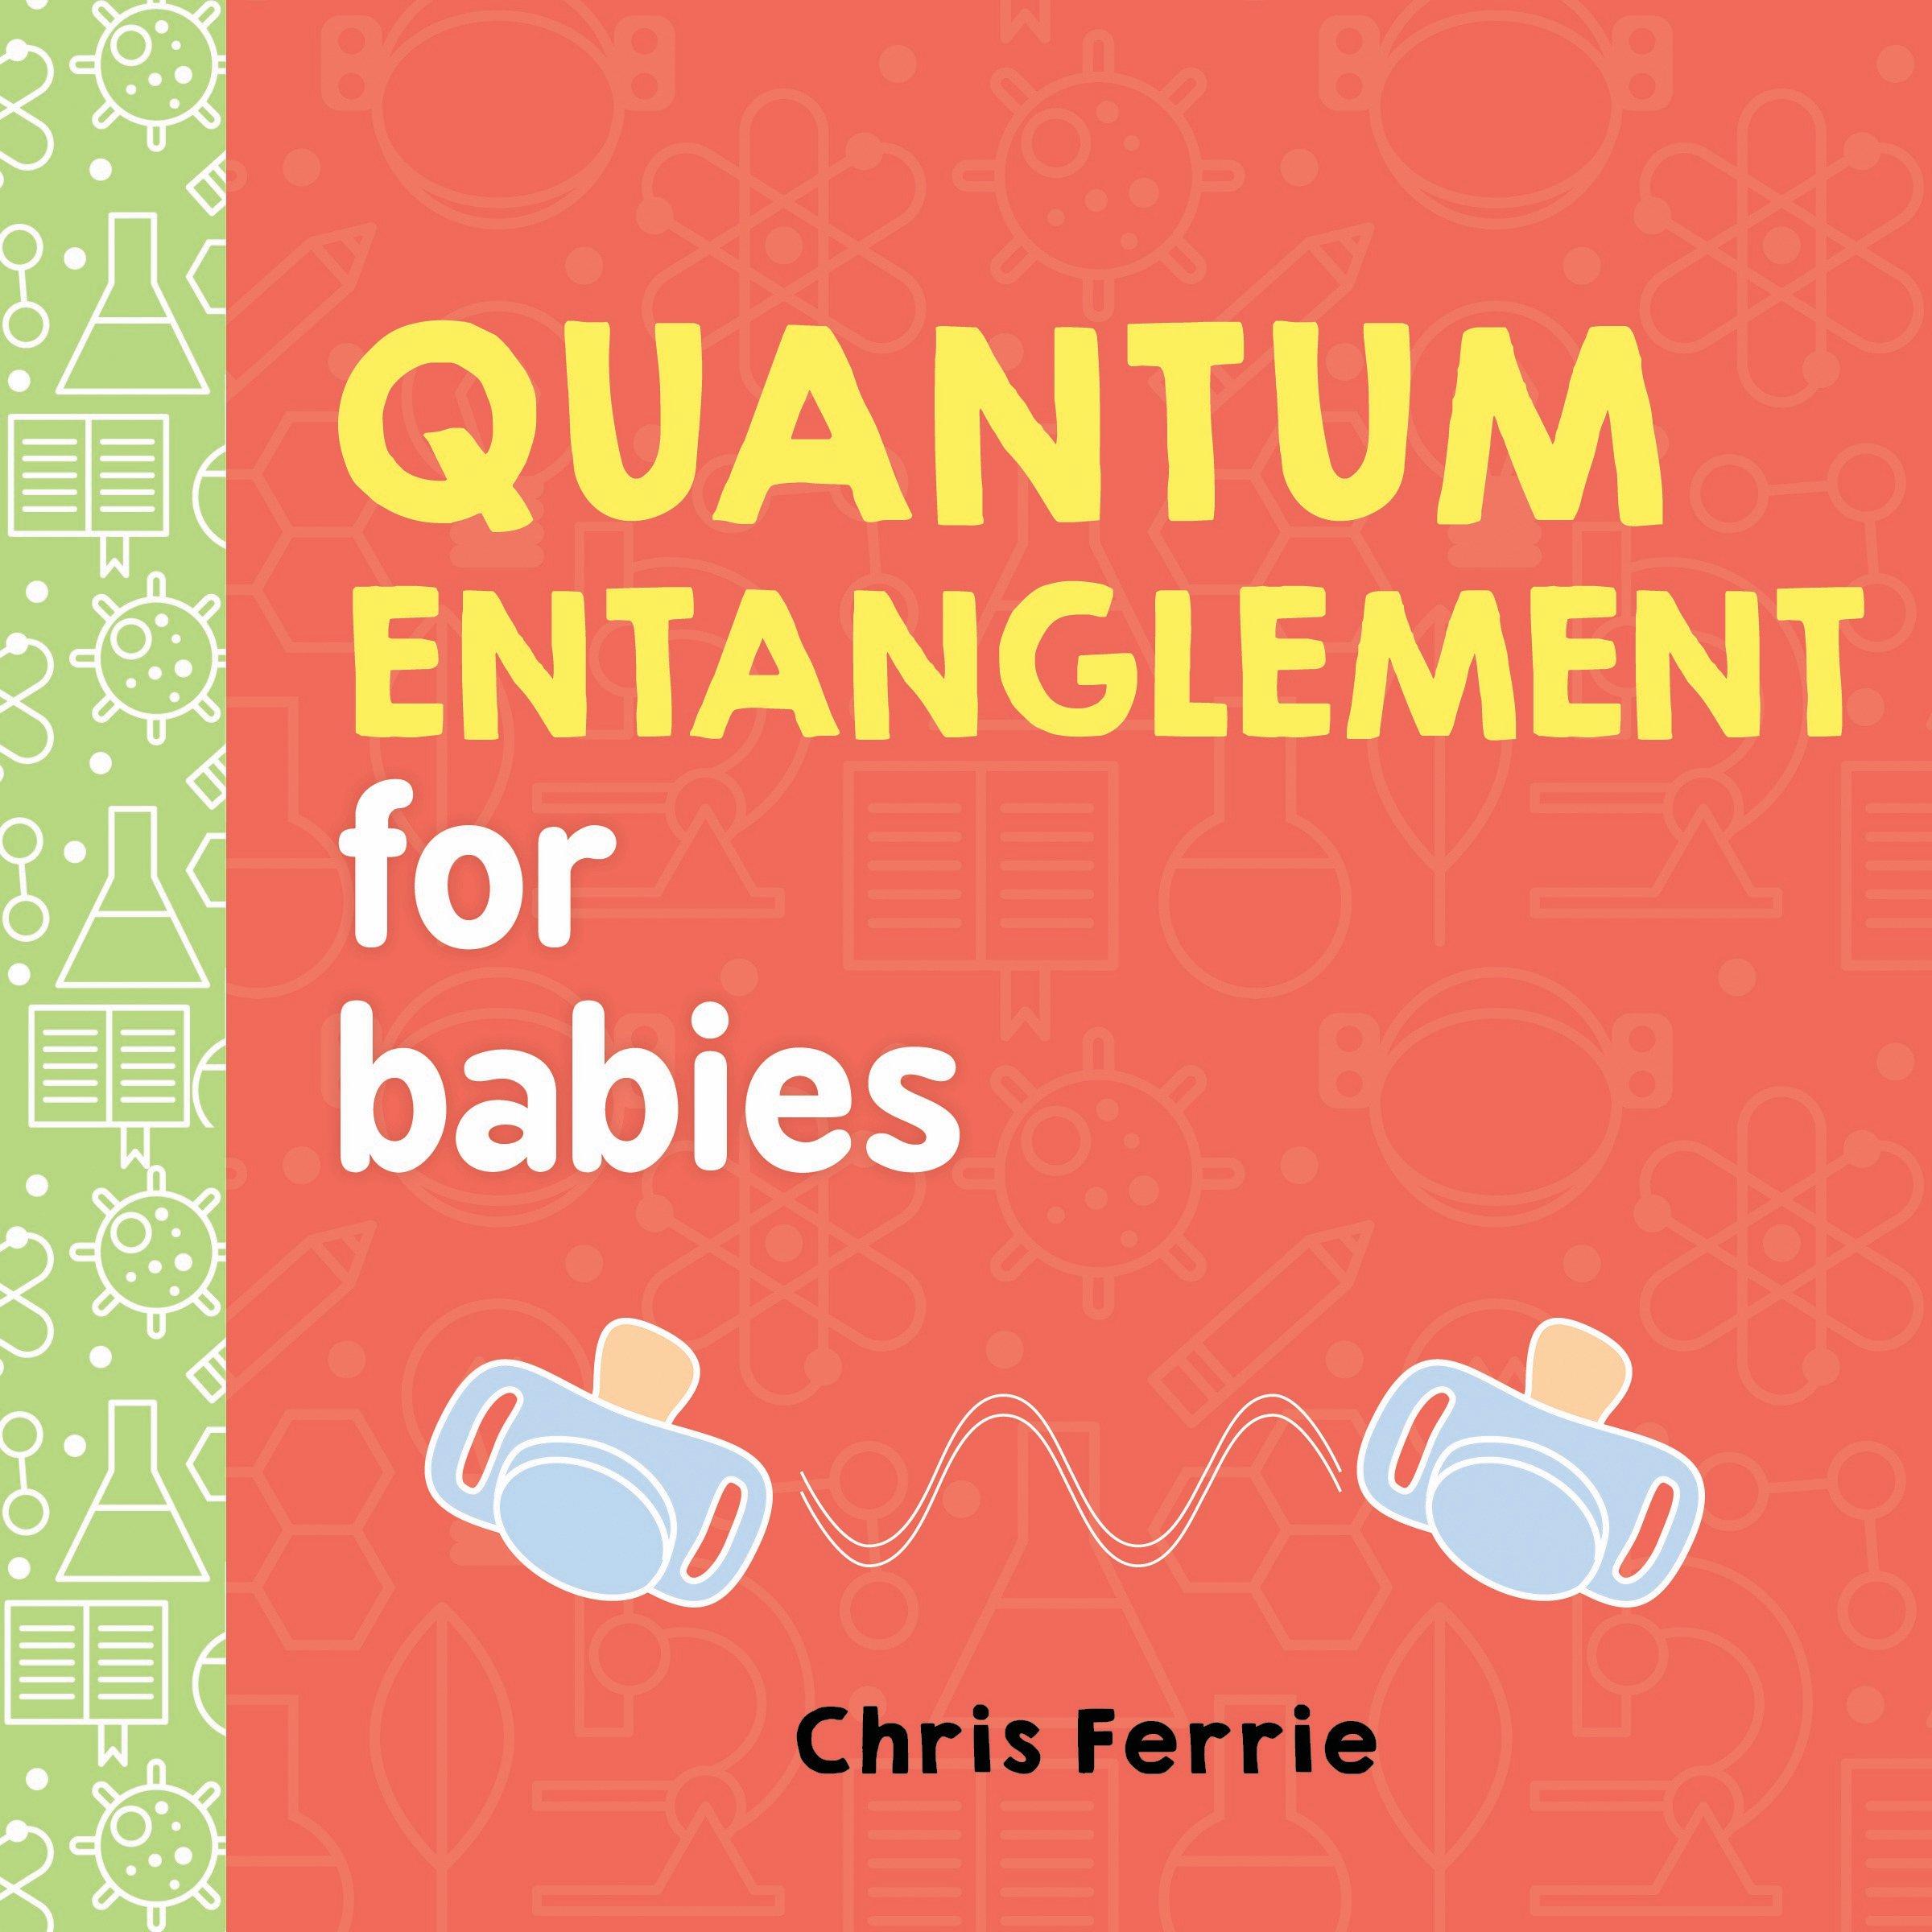 Quantum Entanglement For Babies  Baby University